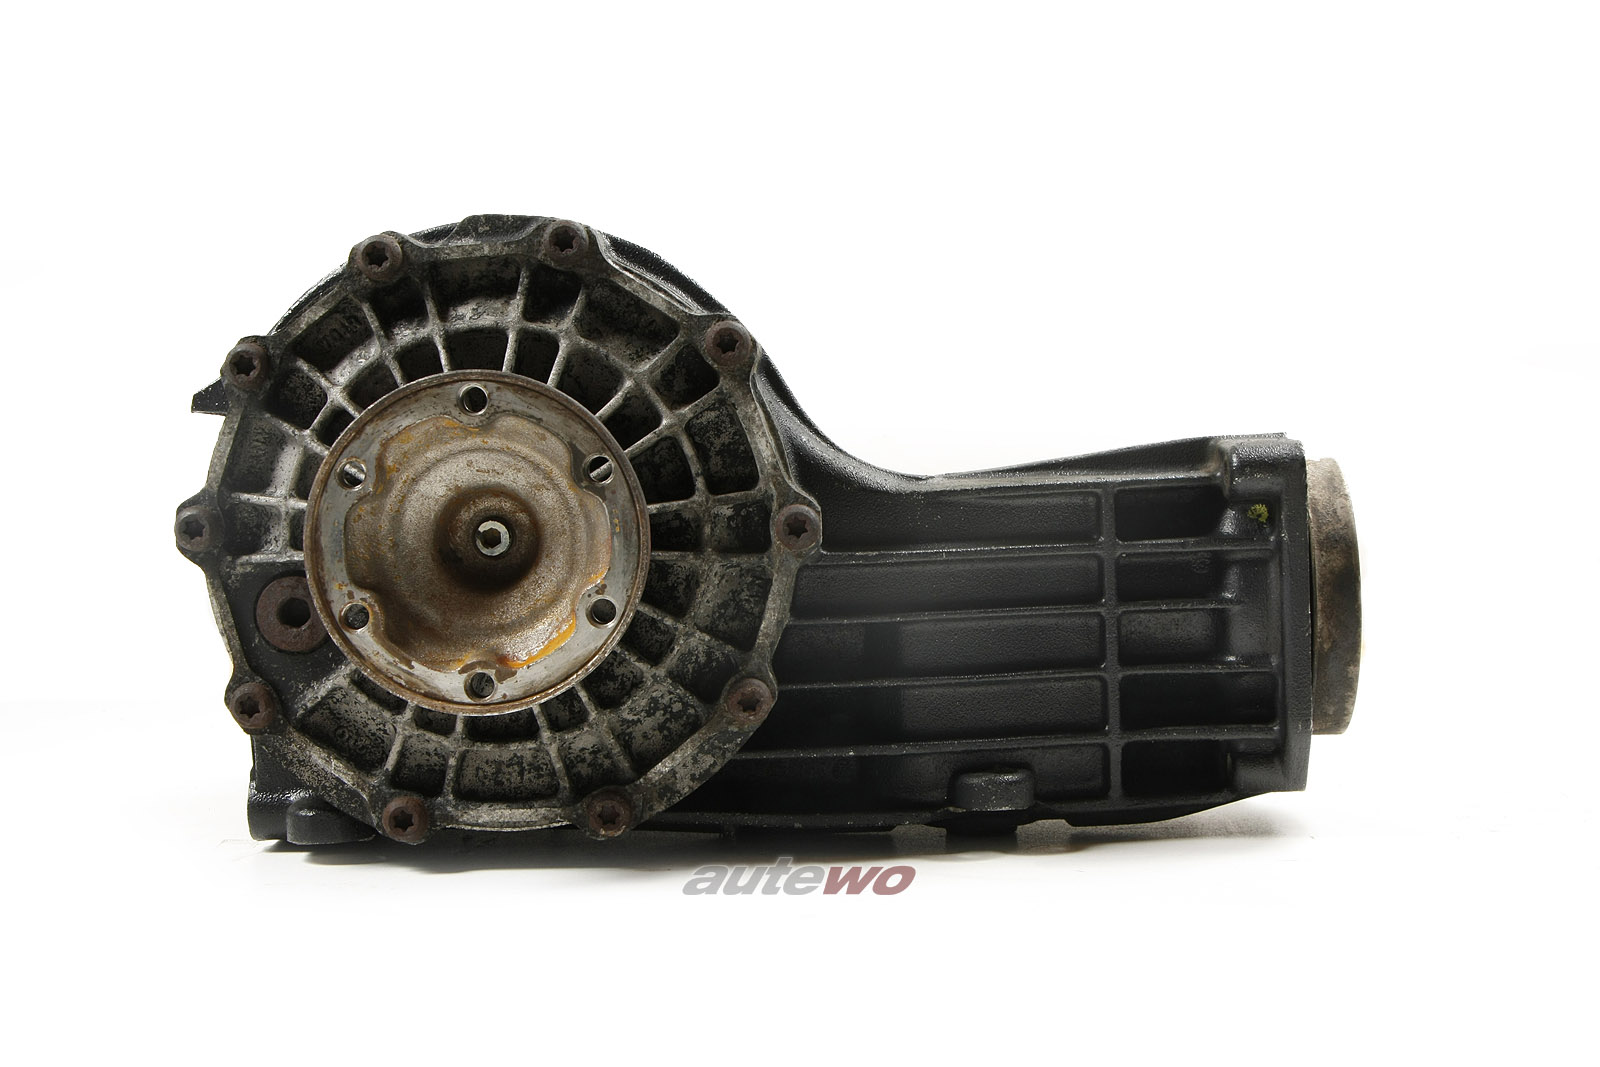 01R500043M Audi A8/S8 D2 4.2l Differential DGZ 03126 auch passend für DNW